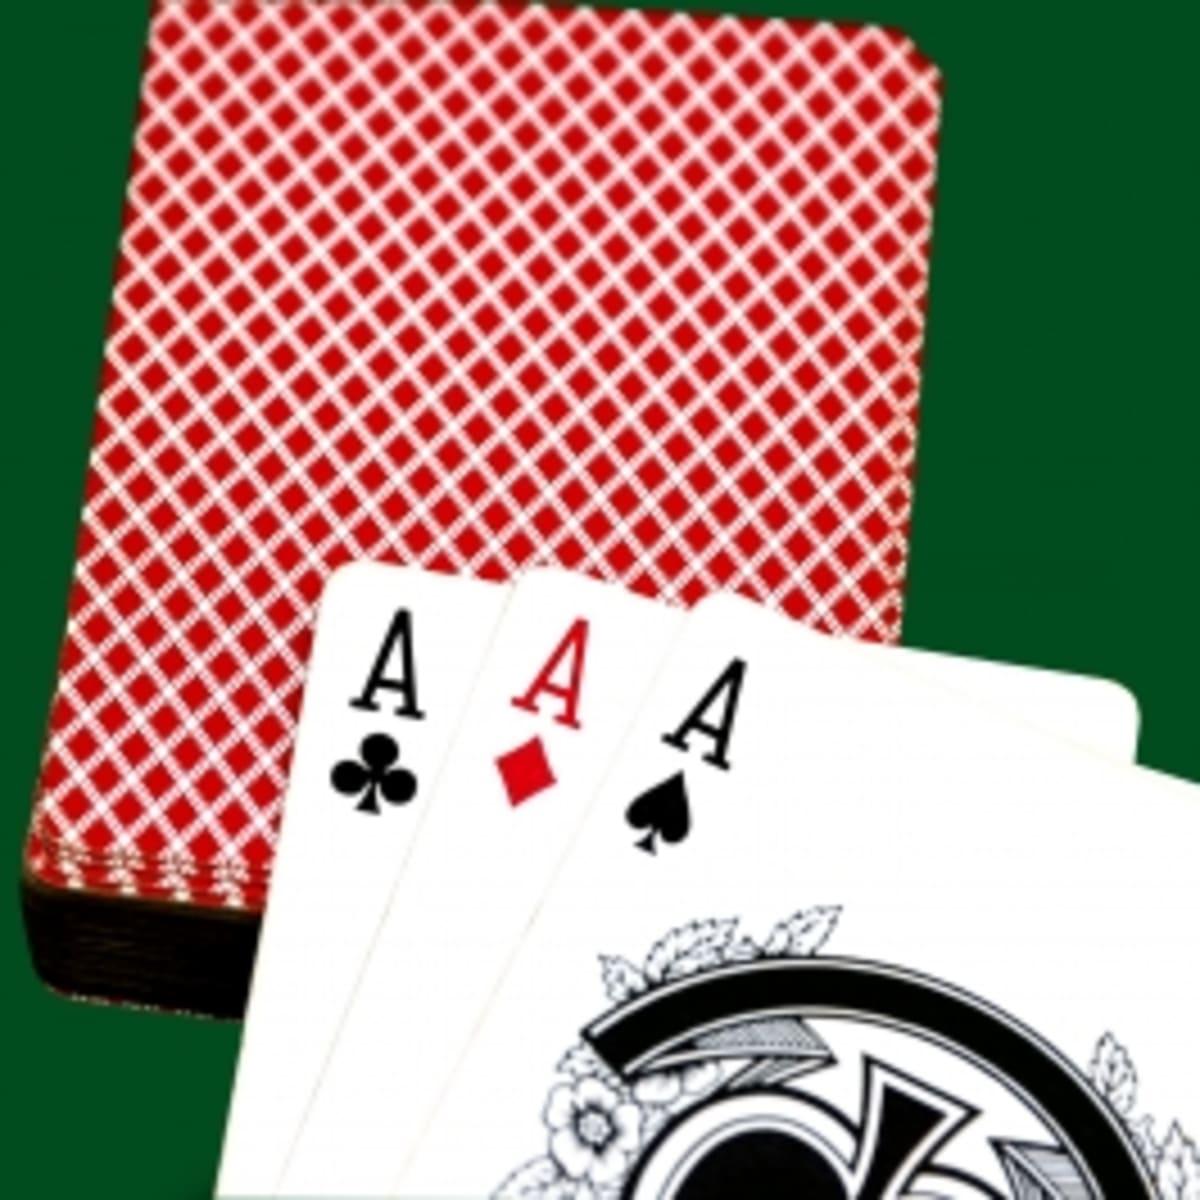 31 card game betting stosur vs ivanovic betting expert boxing